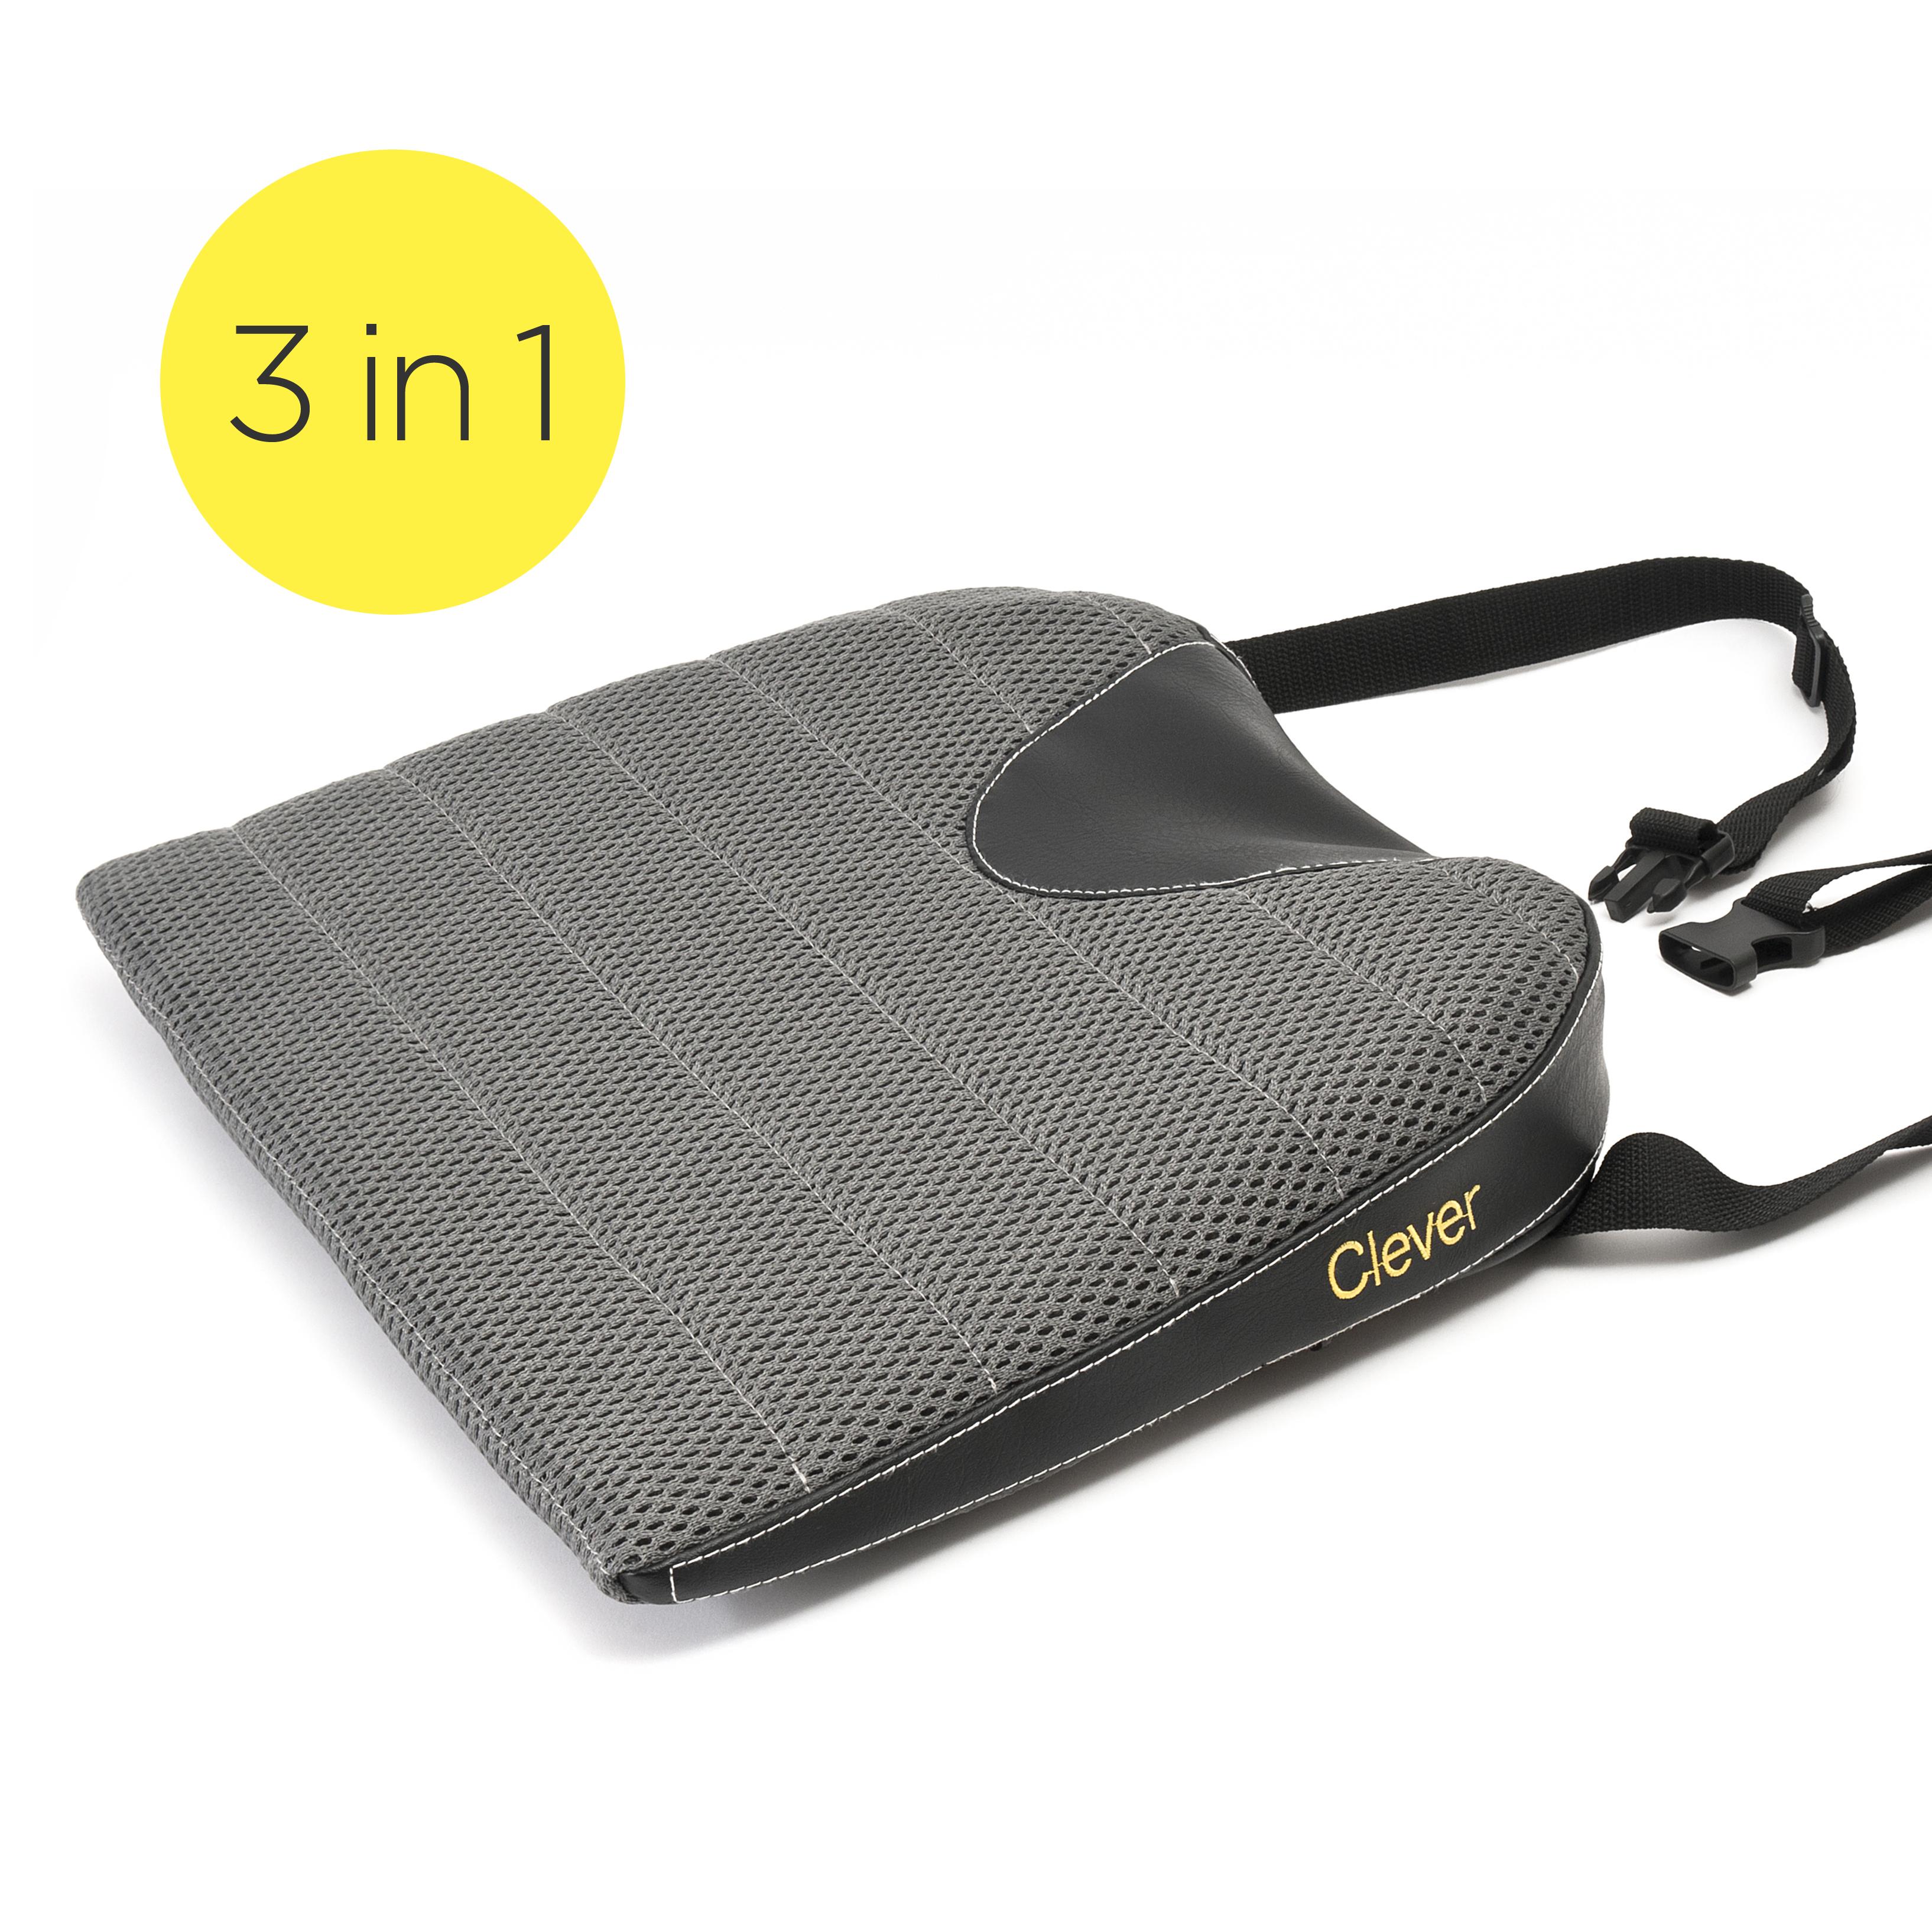 Car Seat Cushion Ergonomic Three Layer Technology